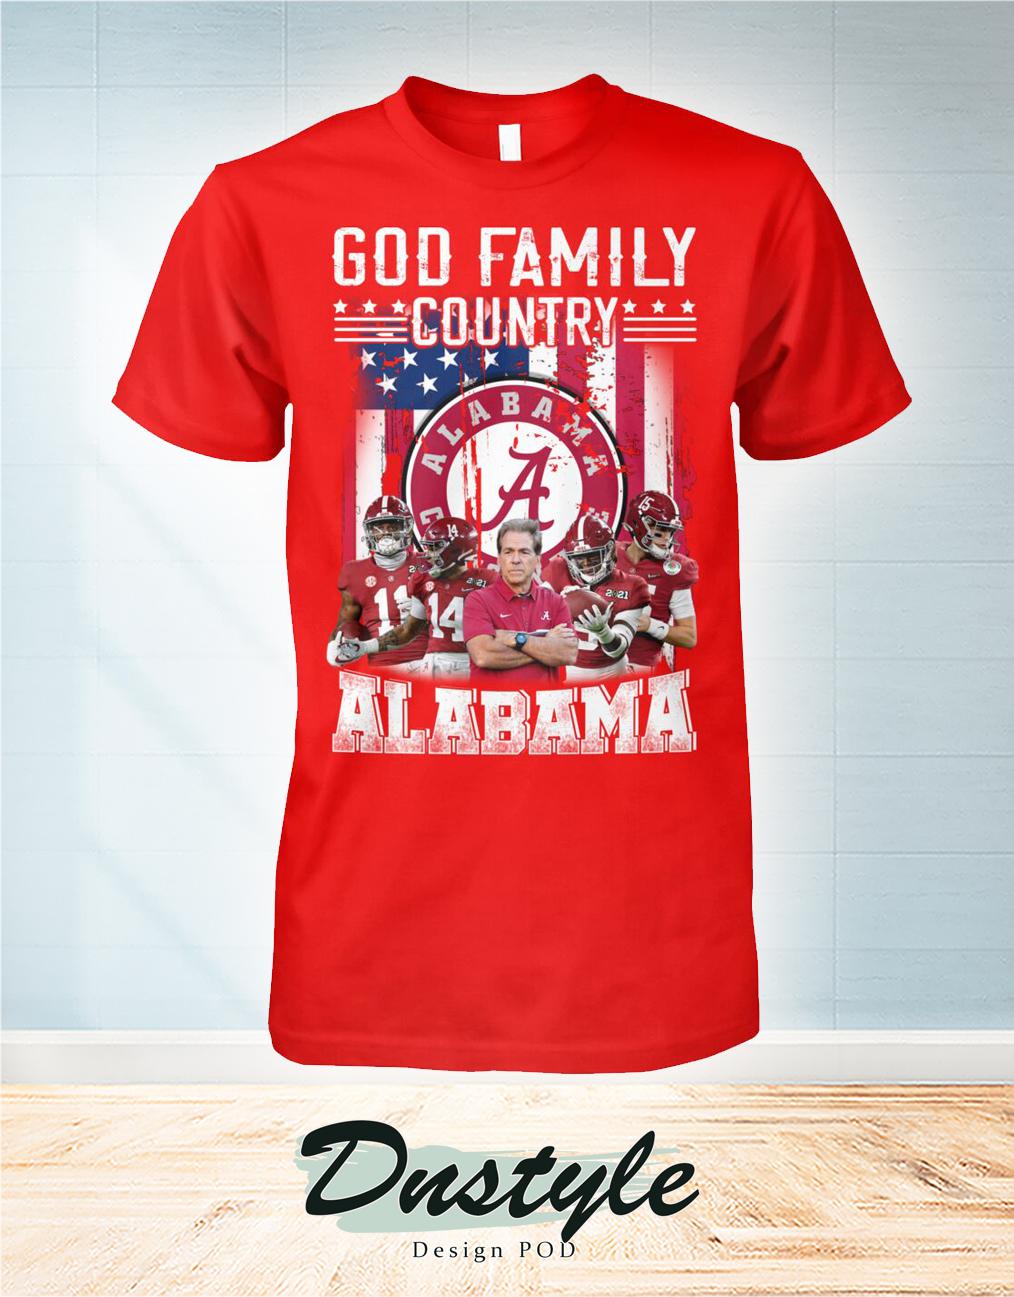 God family country Alabama shirt